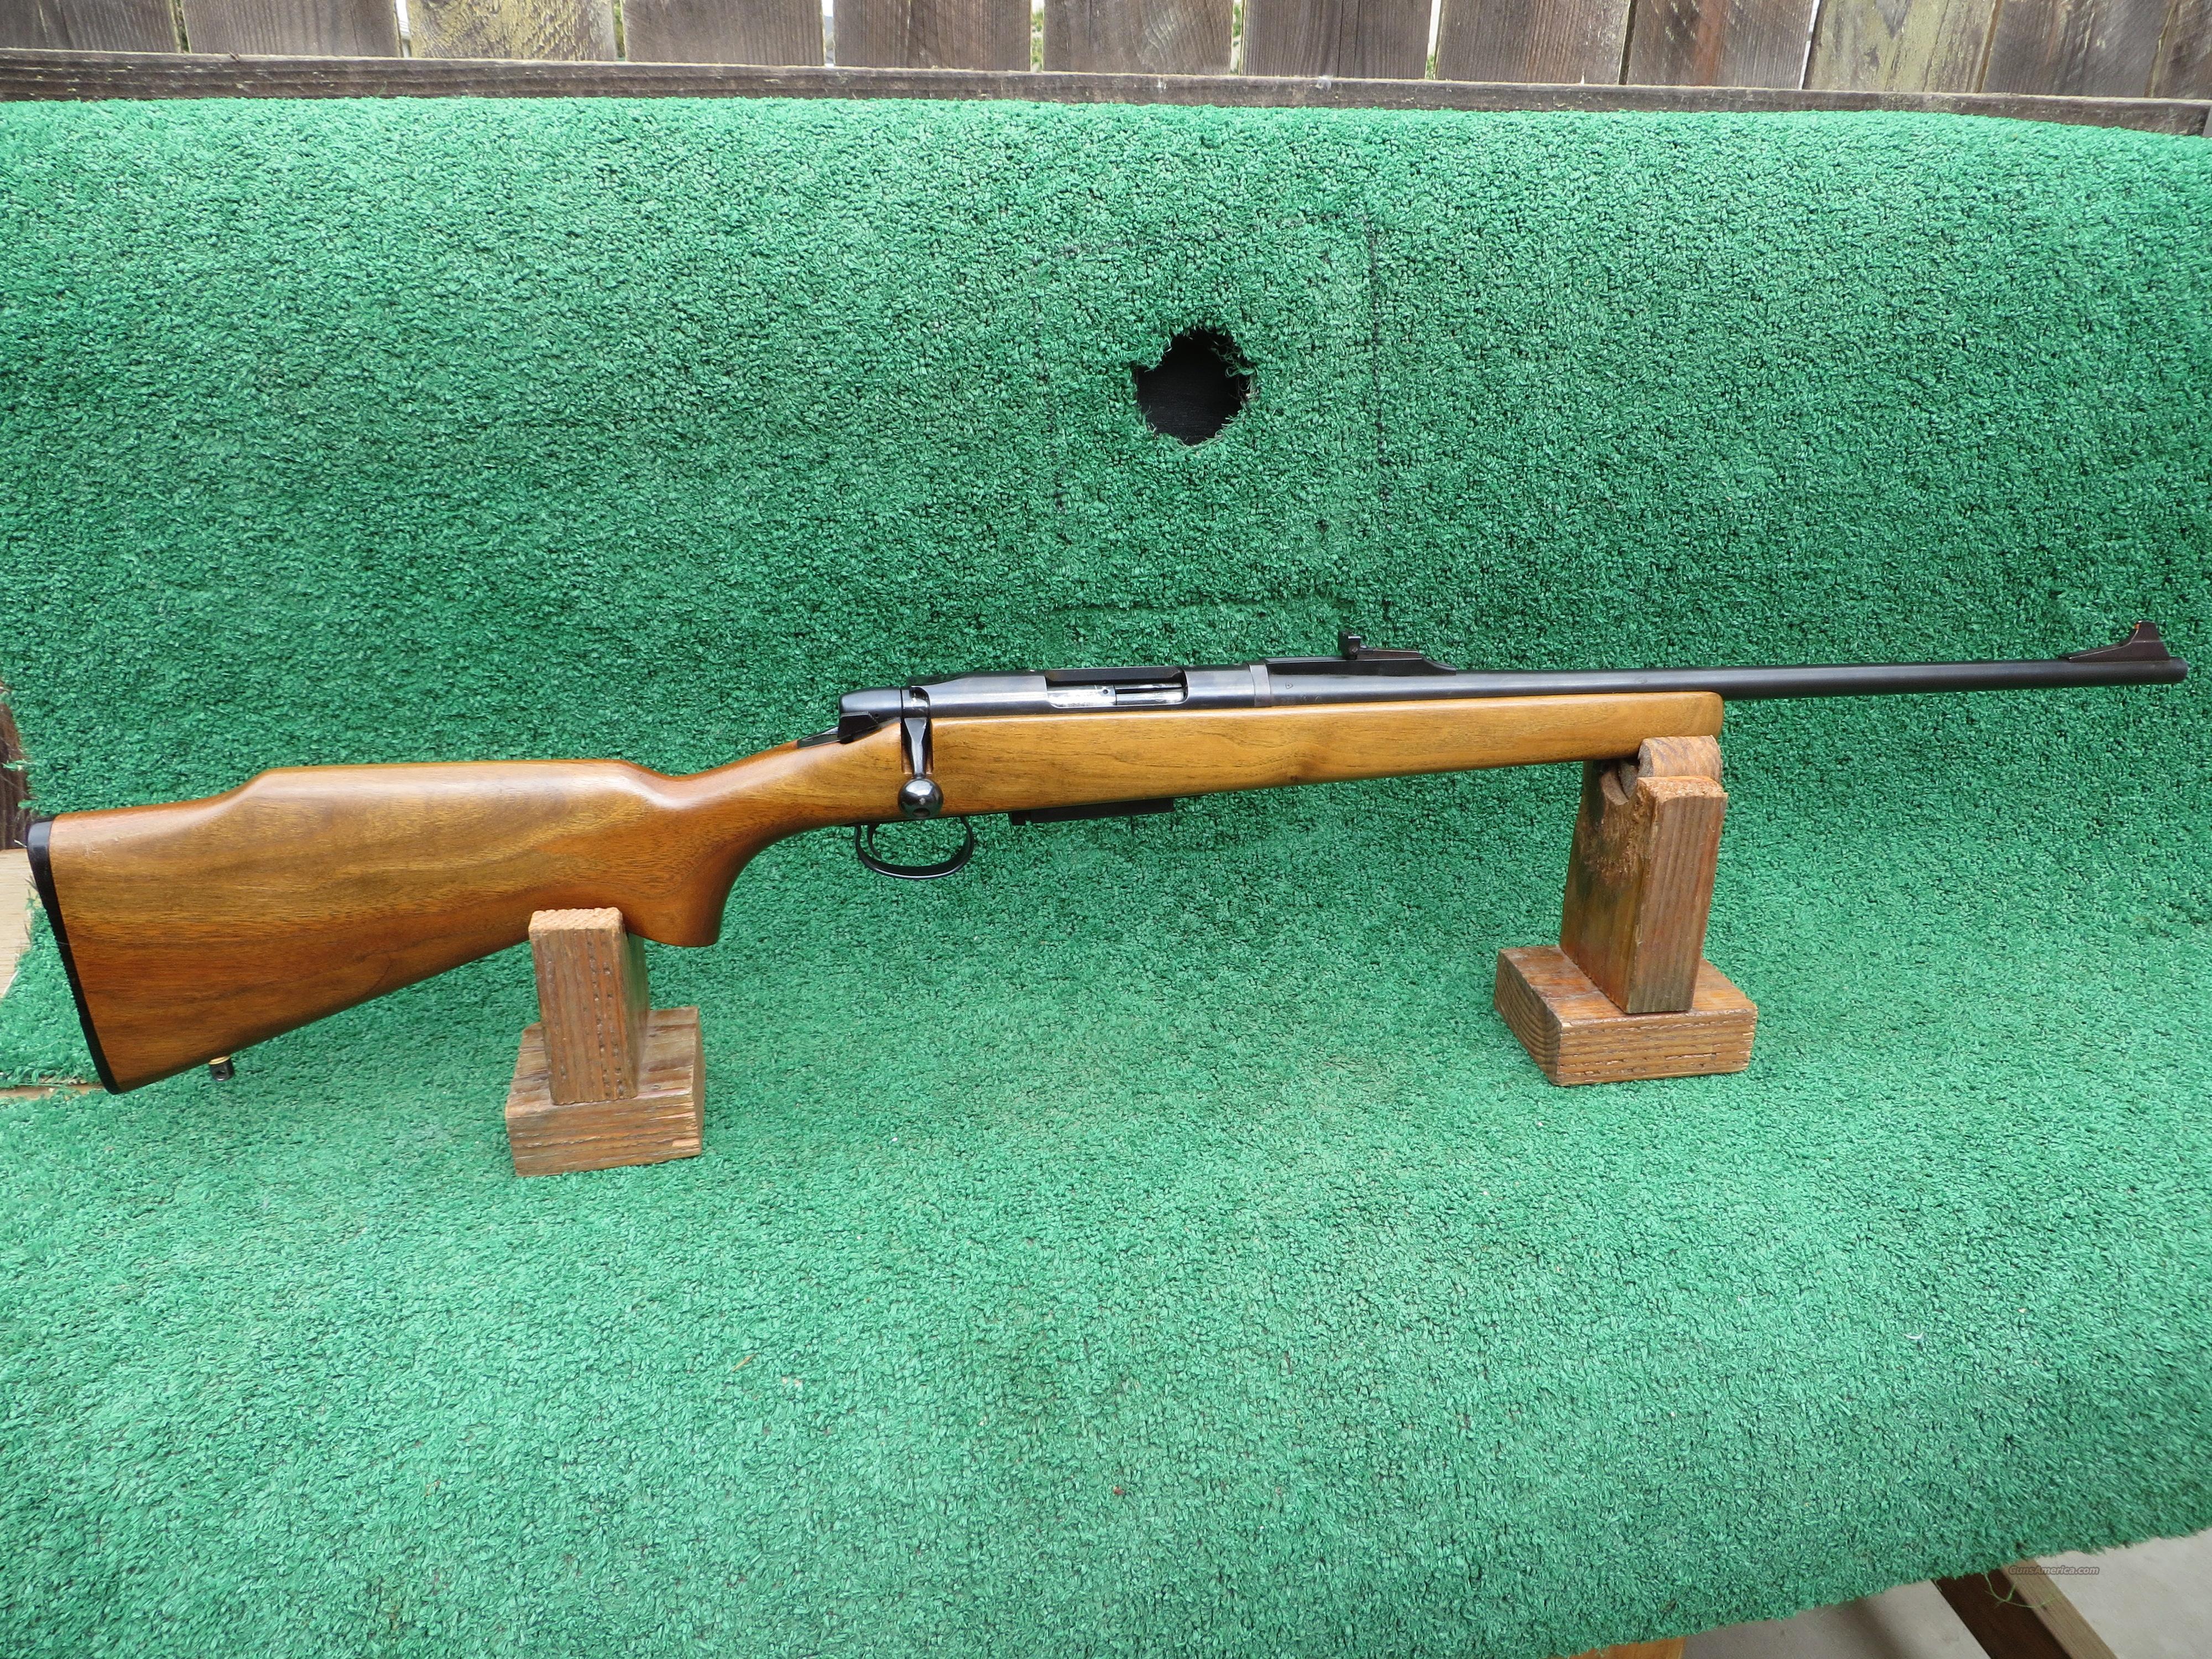 Remington 788 30-30 bolt rifle